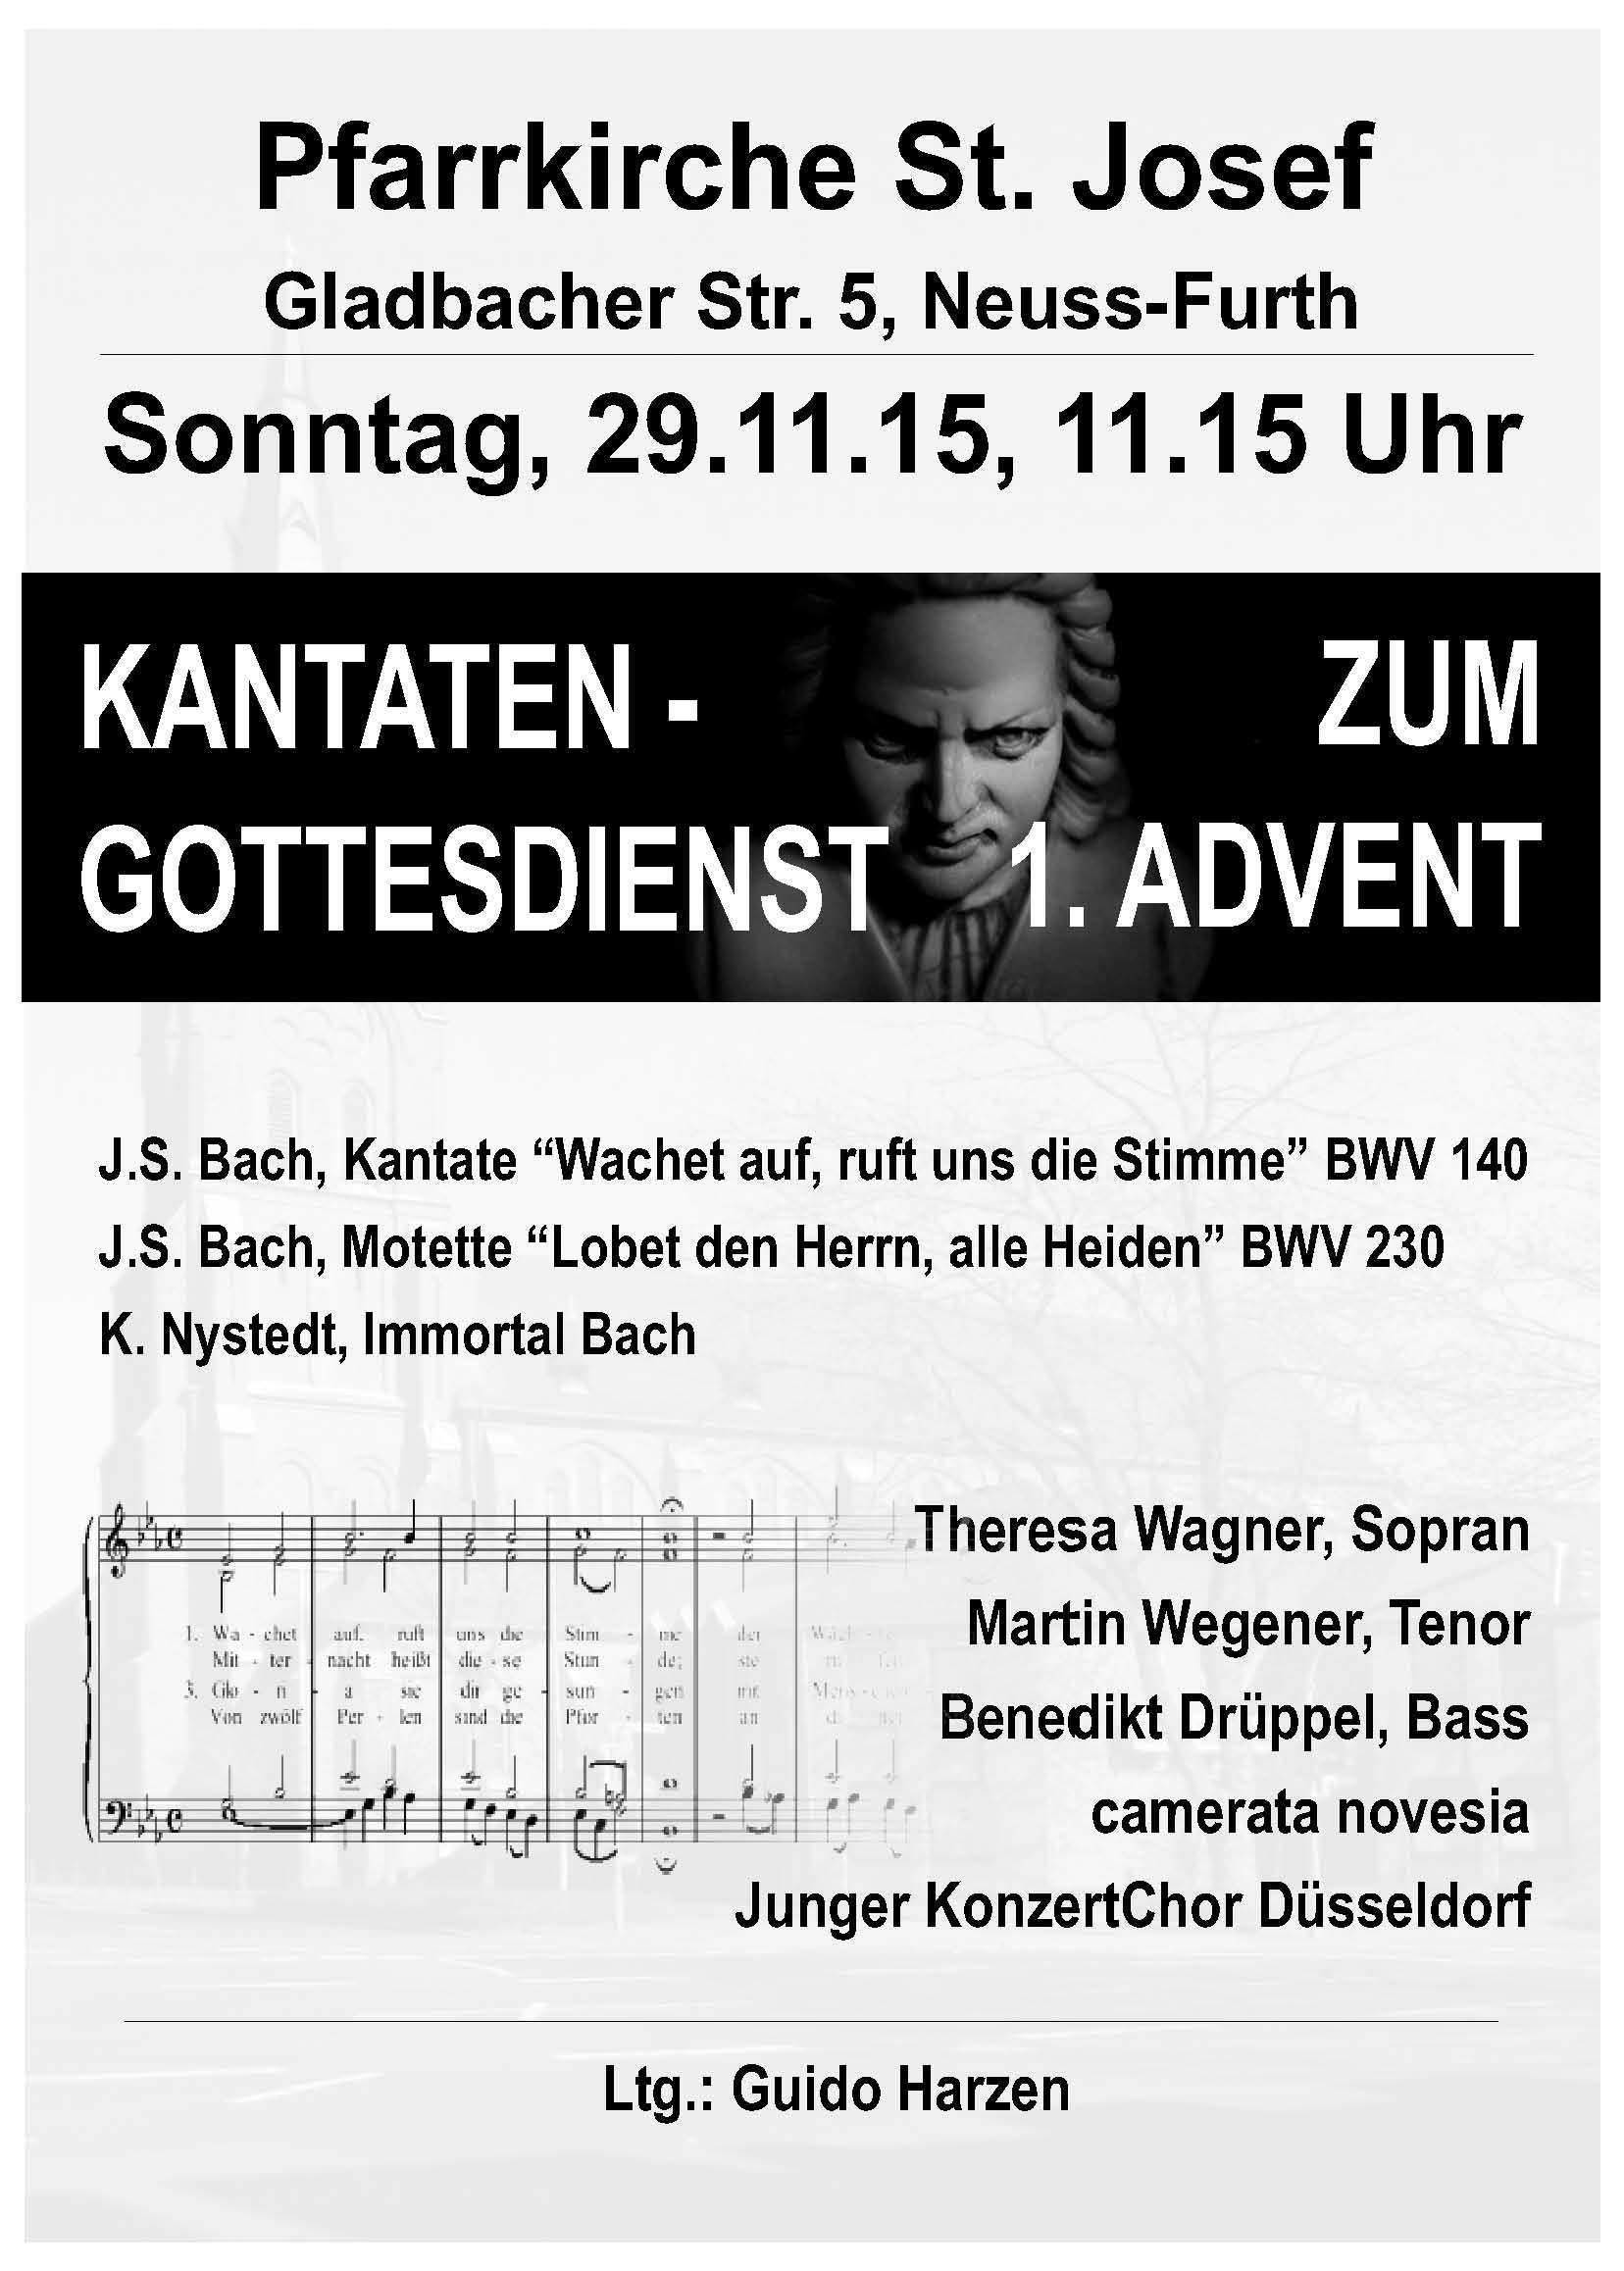 2015 11 29 JKCD Kantaten-Gottesdienst Bach